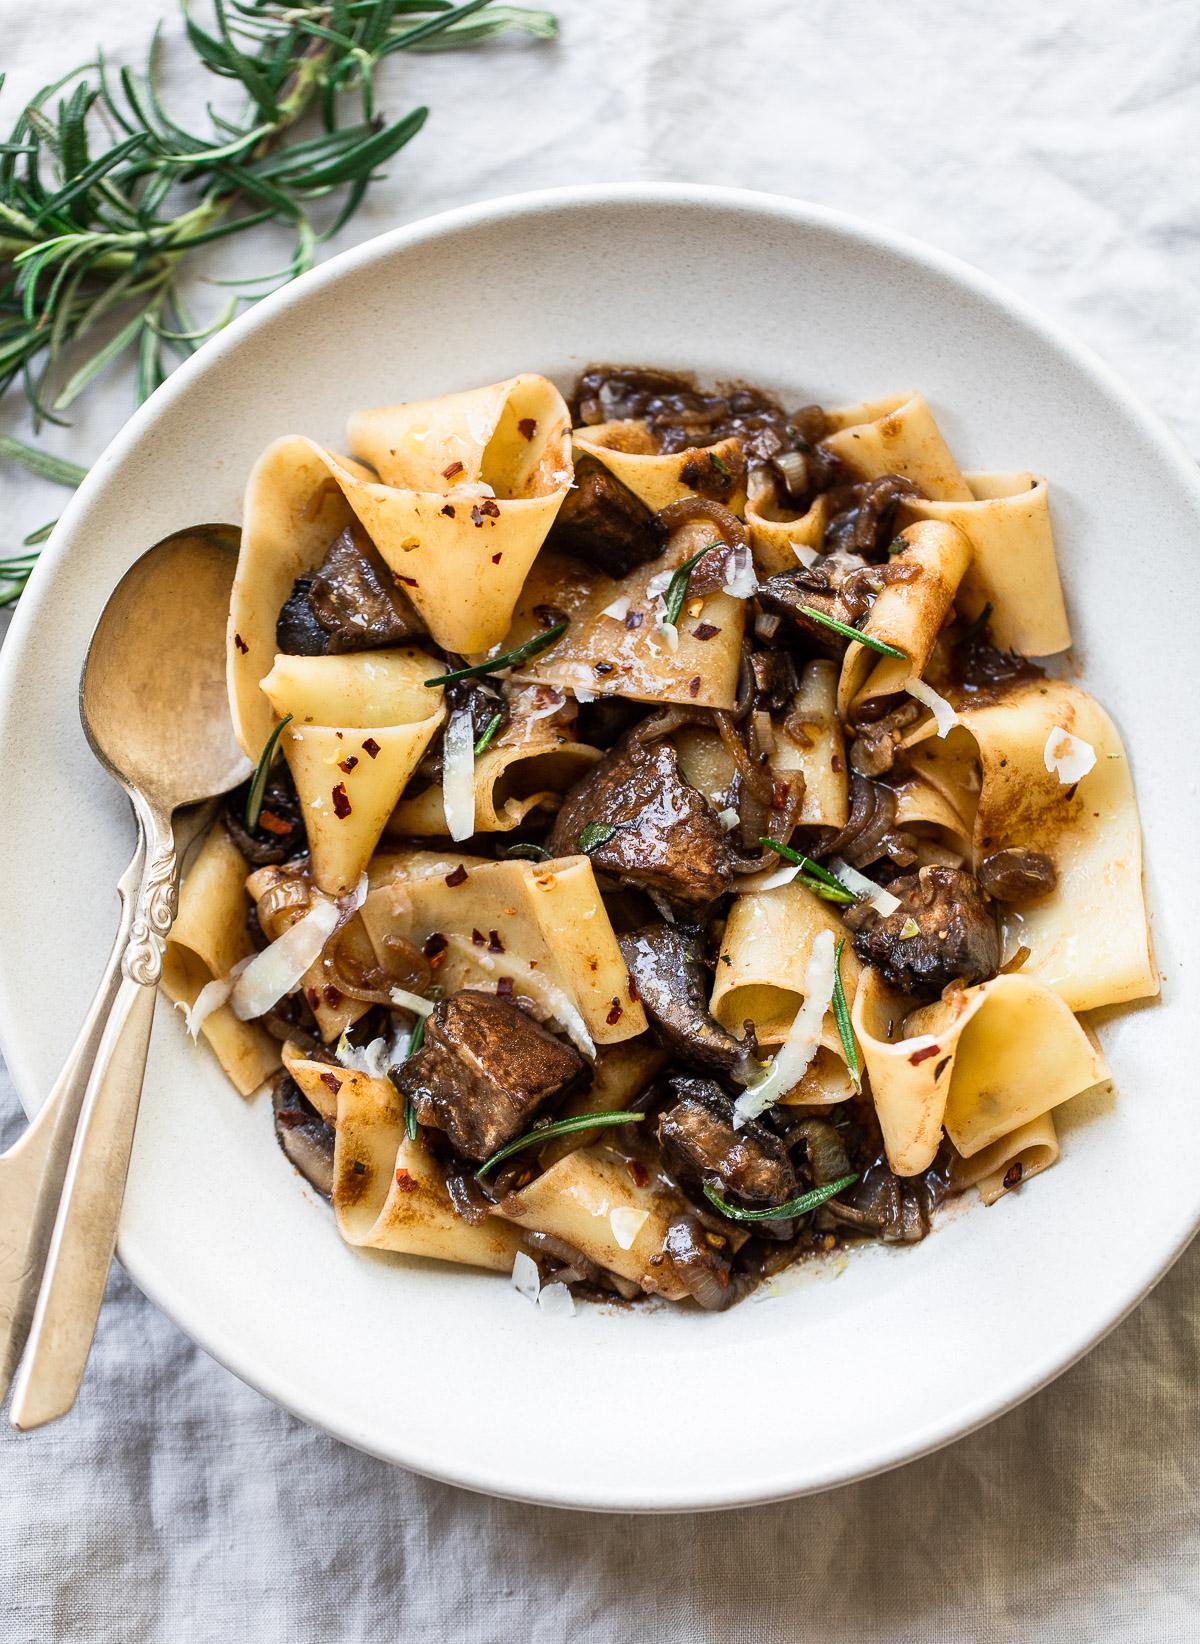 Pappardelle Pasta with Wild Mushroom Ragu